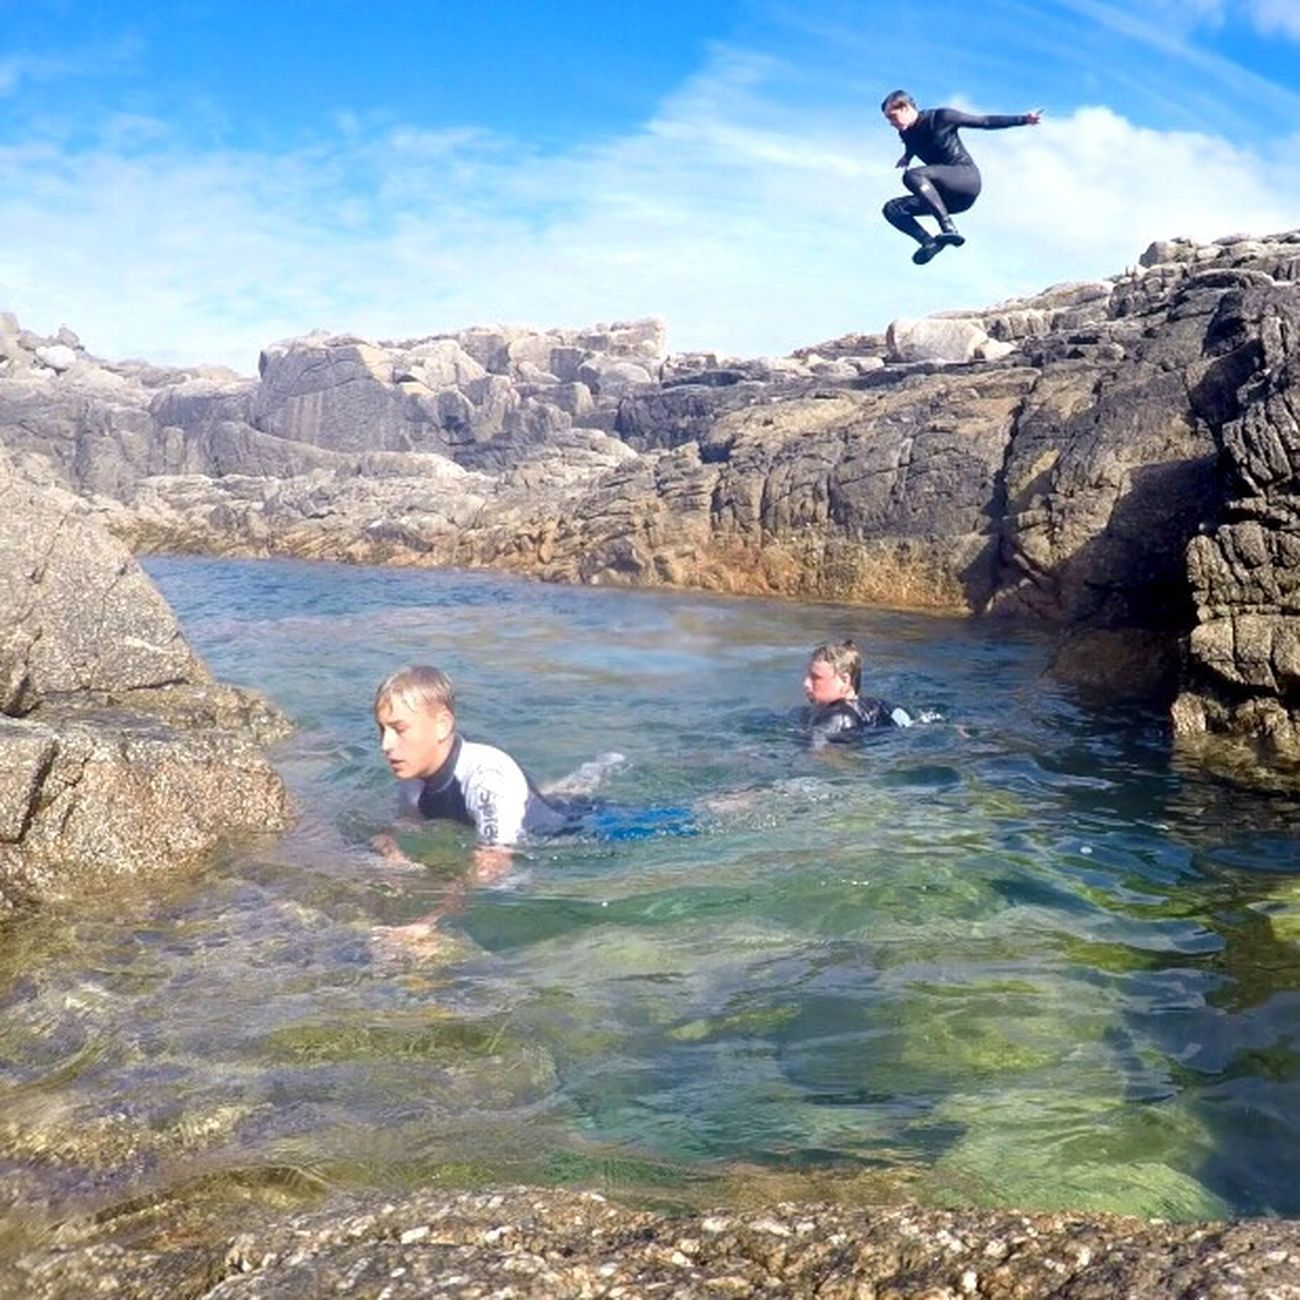 Shipman head cove Water EyeEm Best Shots Fun Enjoyment Jump Leisure Activity CliffJumping Billabong Rock - Object Tranquil Scene Scenics Vacations